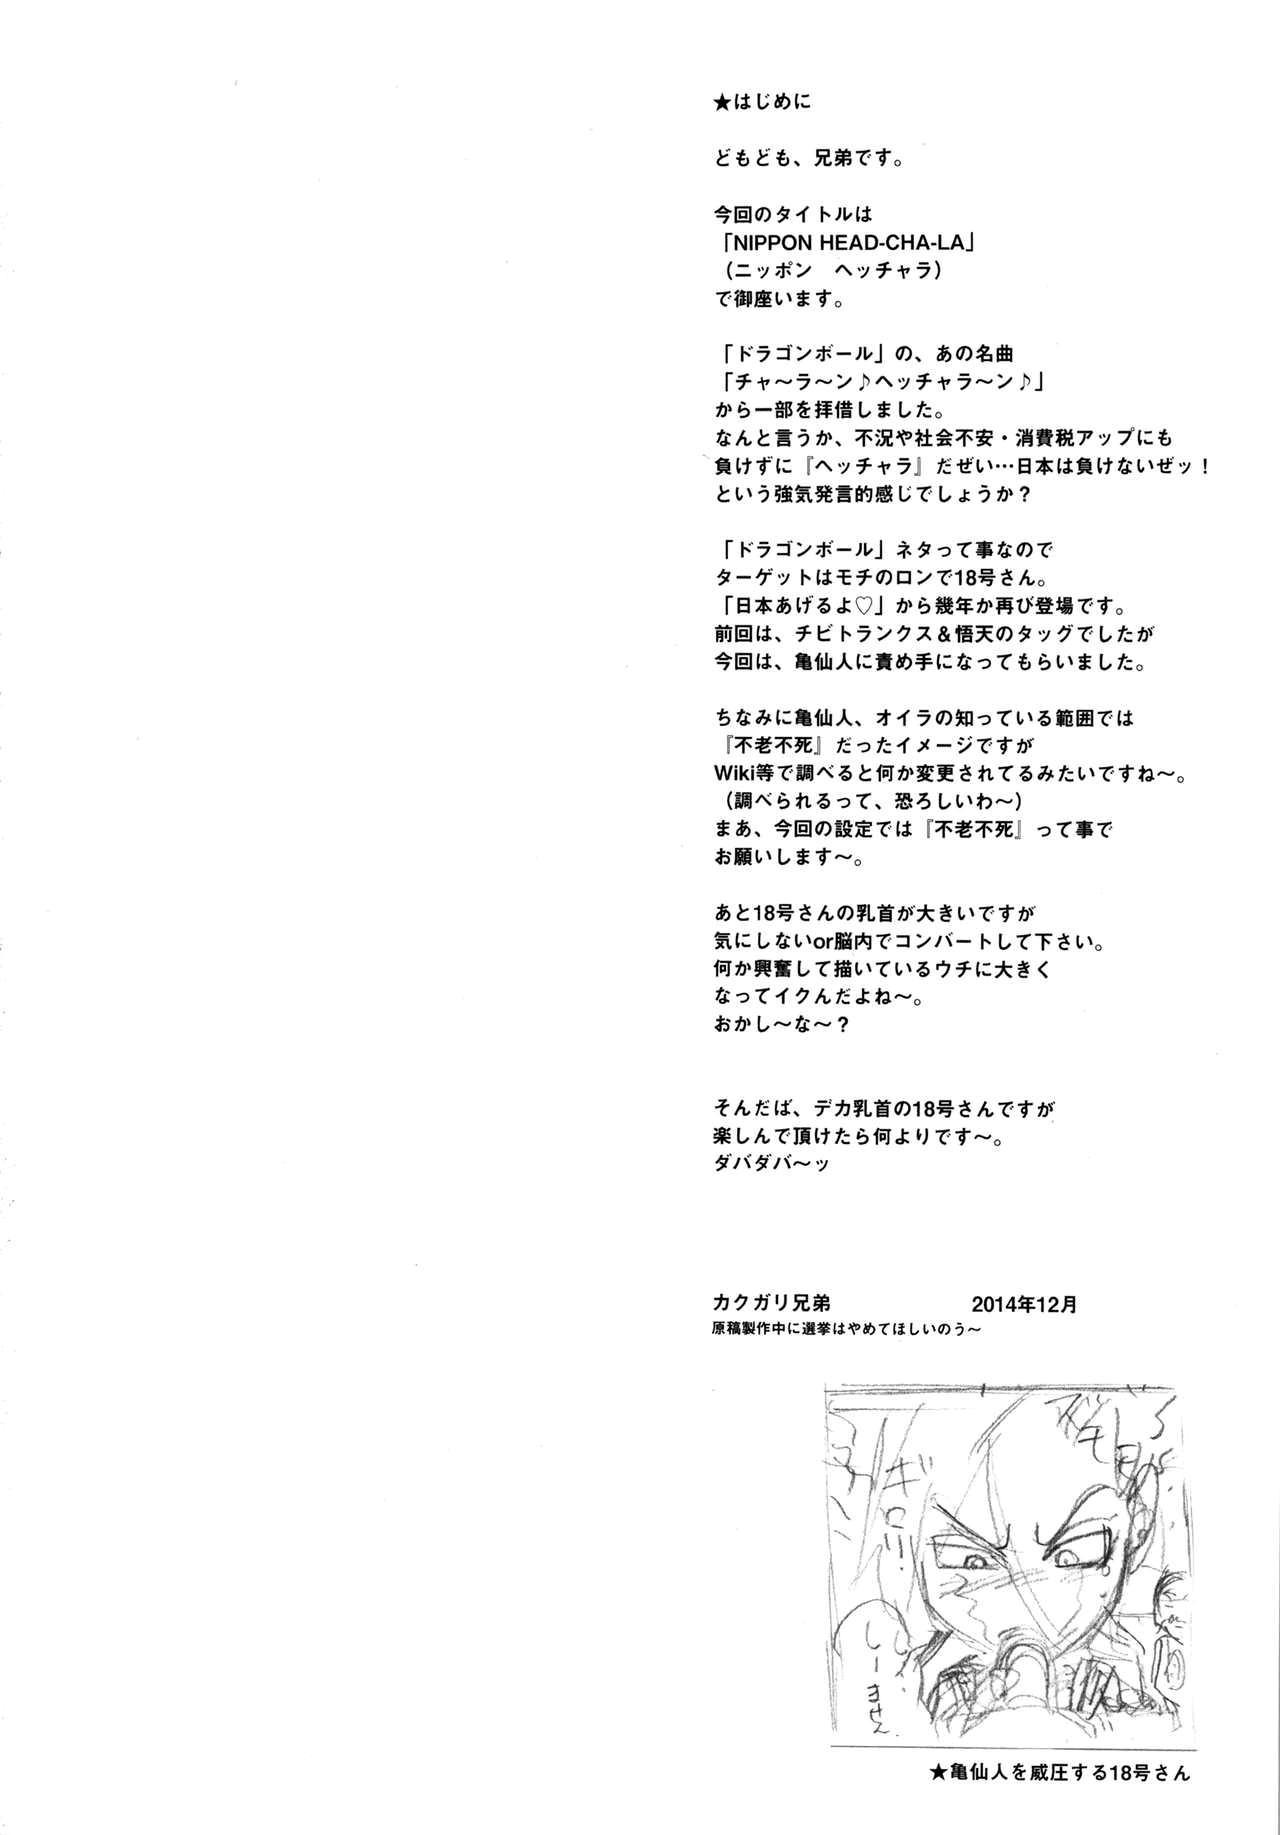 (C87) [Niku Ringo (Kakugari Kyoudai)] NIPPON HEAD-CHA-LA (Dragon Ball Z) [English] [SaHa] [Decensored] 2